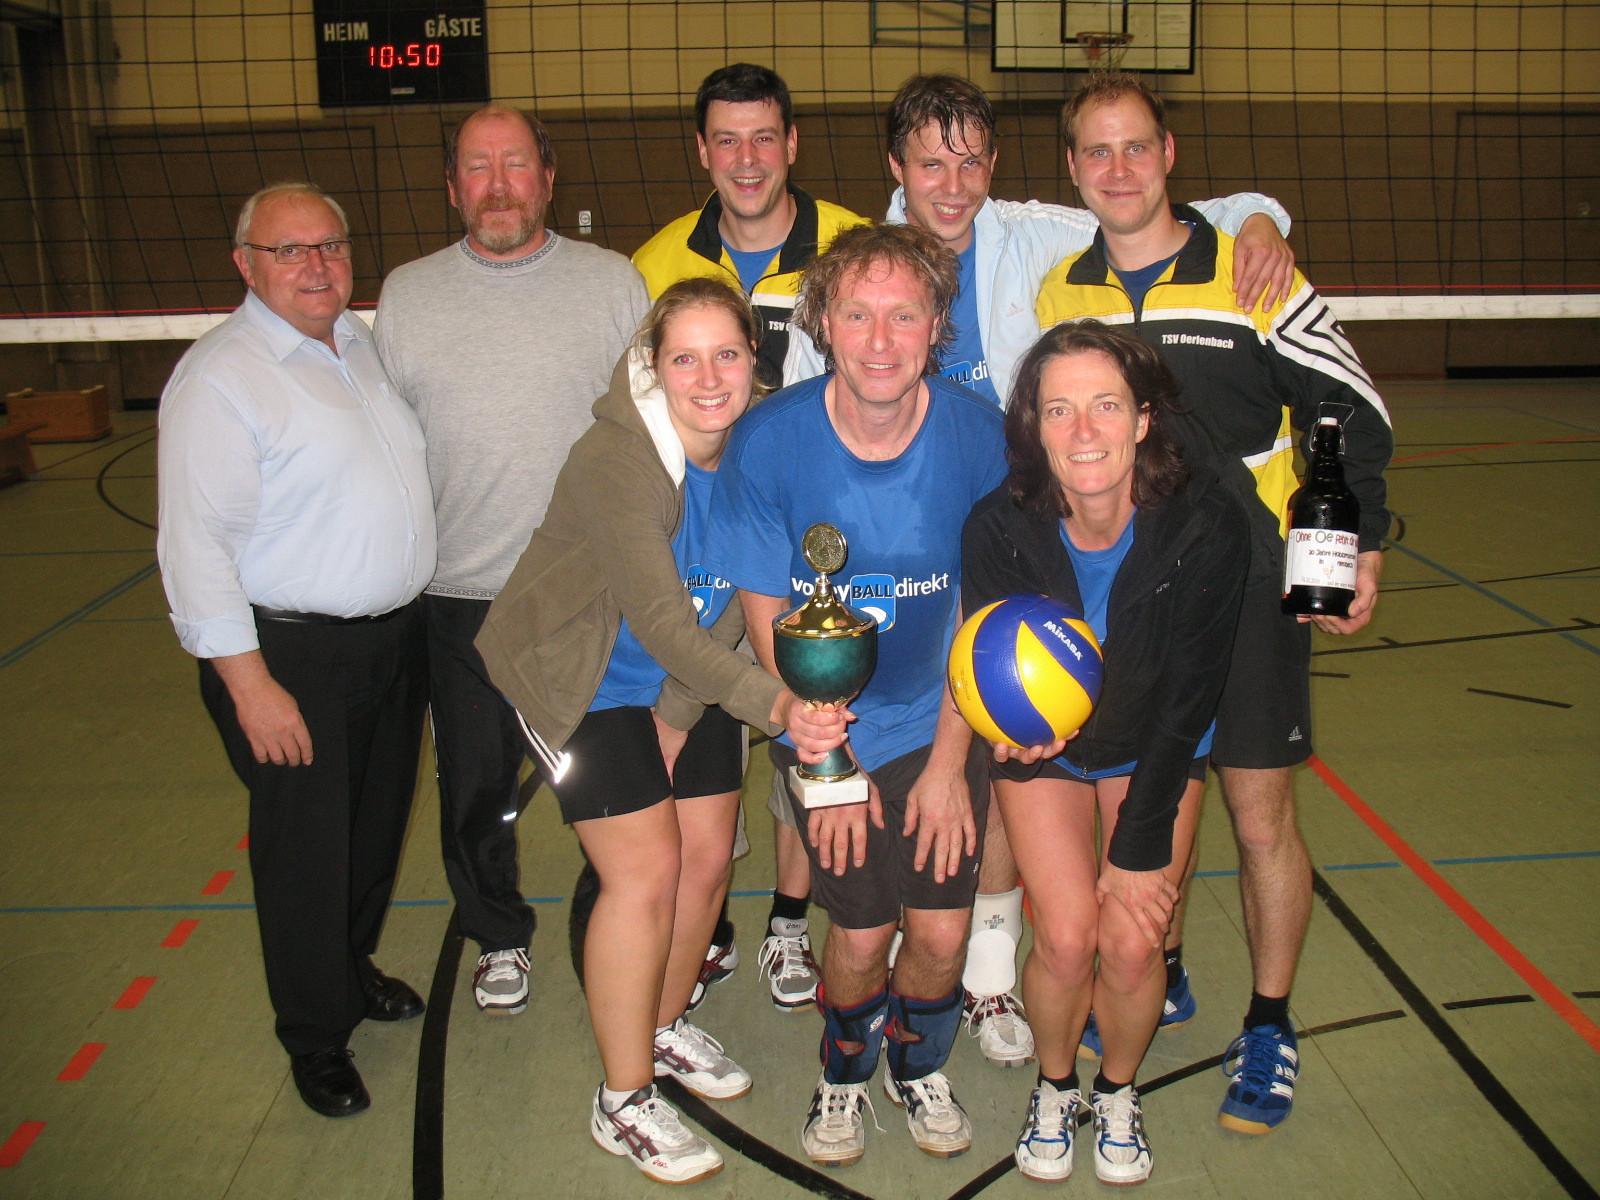 2010 Turnier Oerlenbach